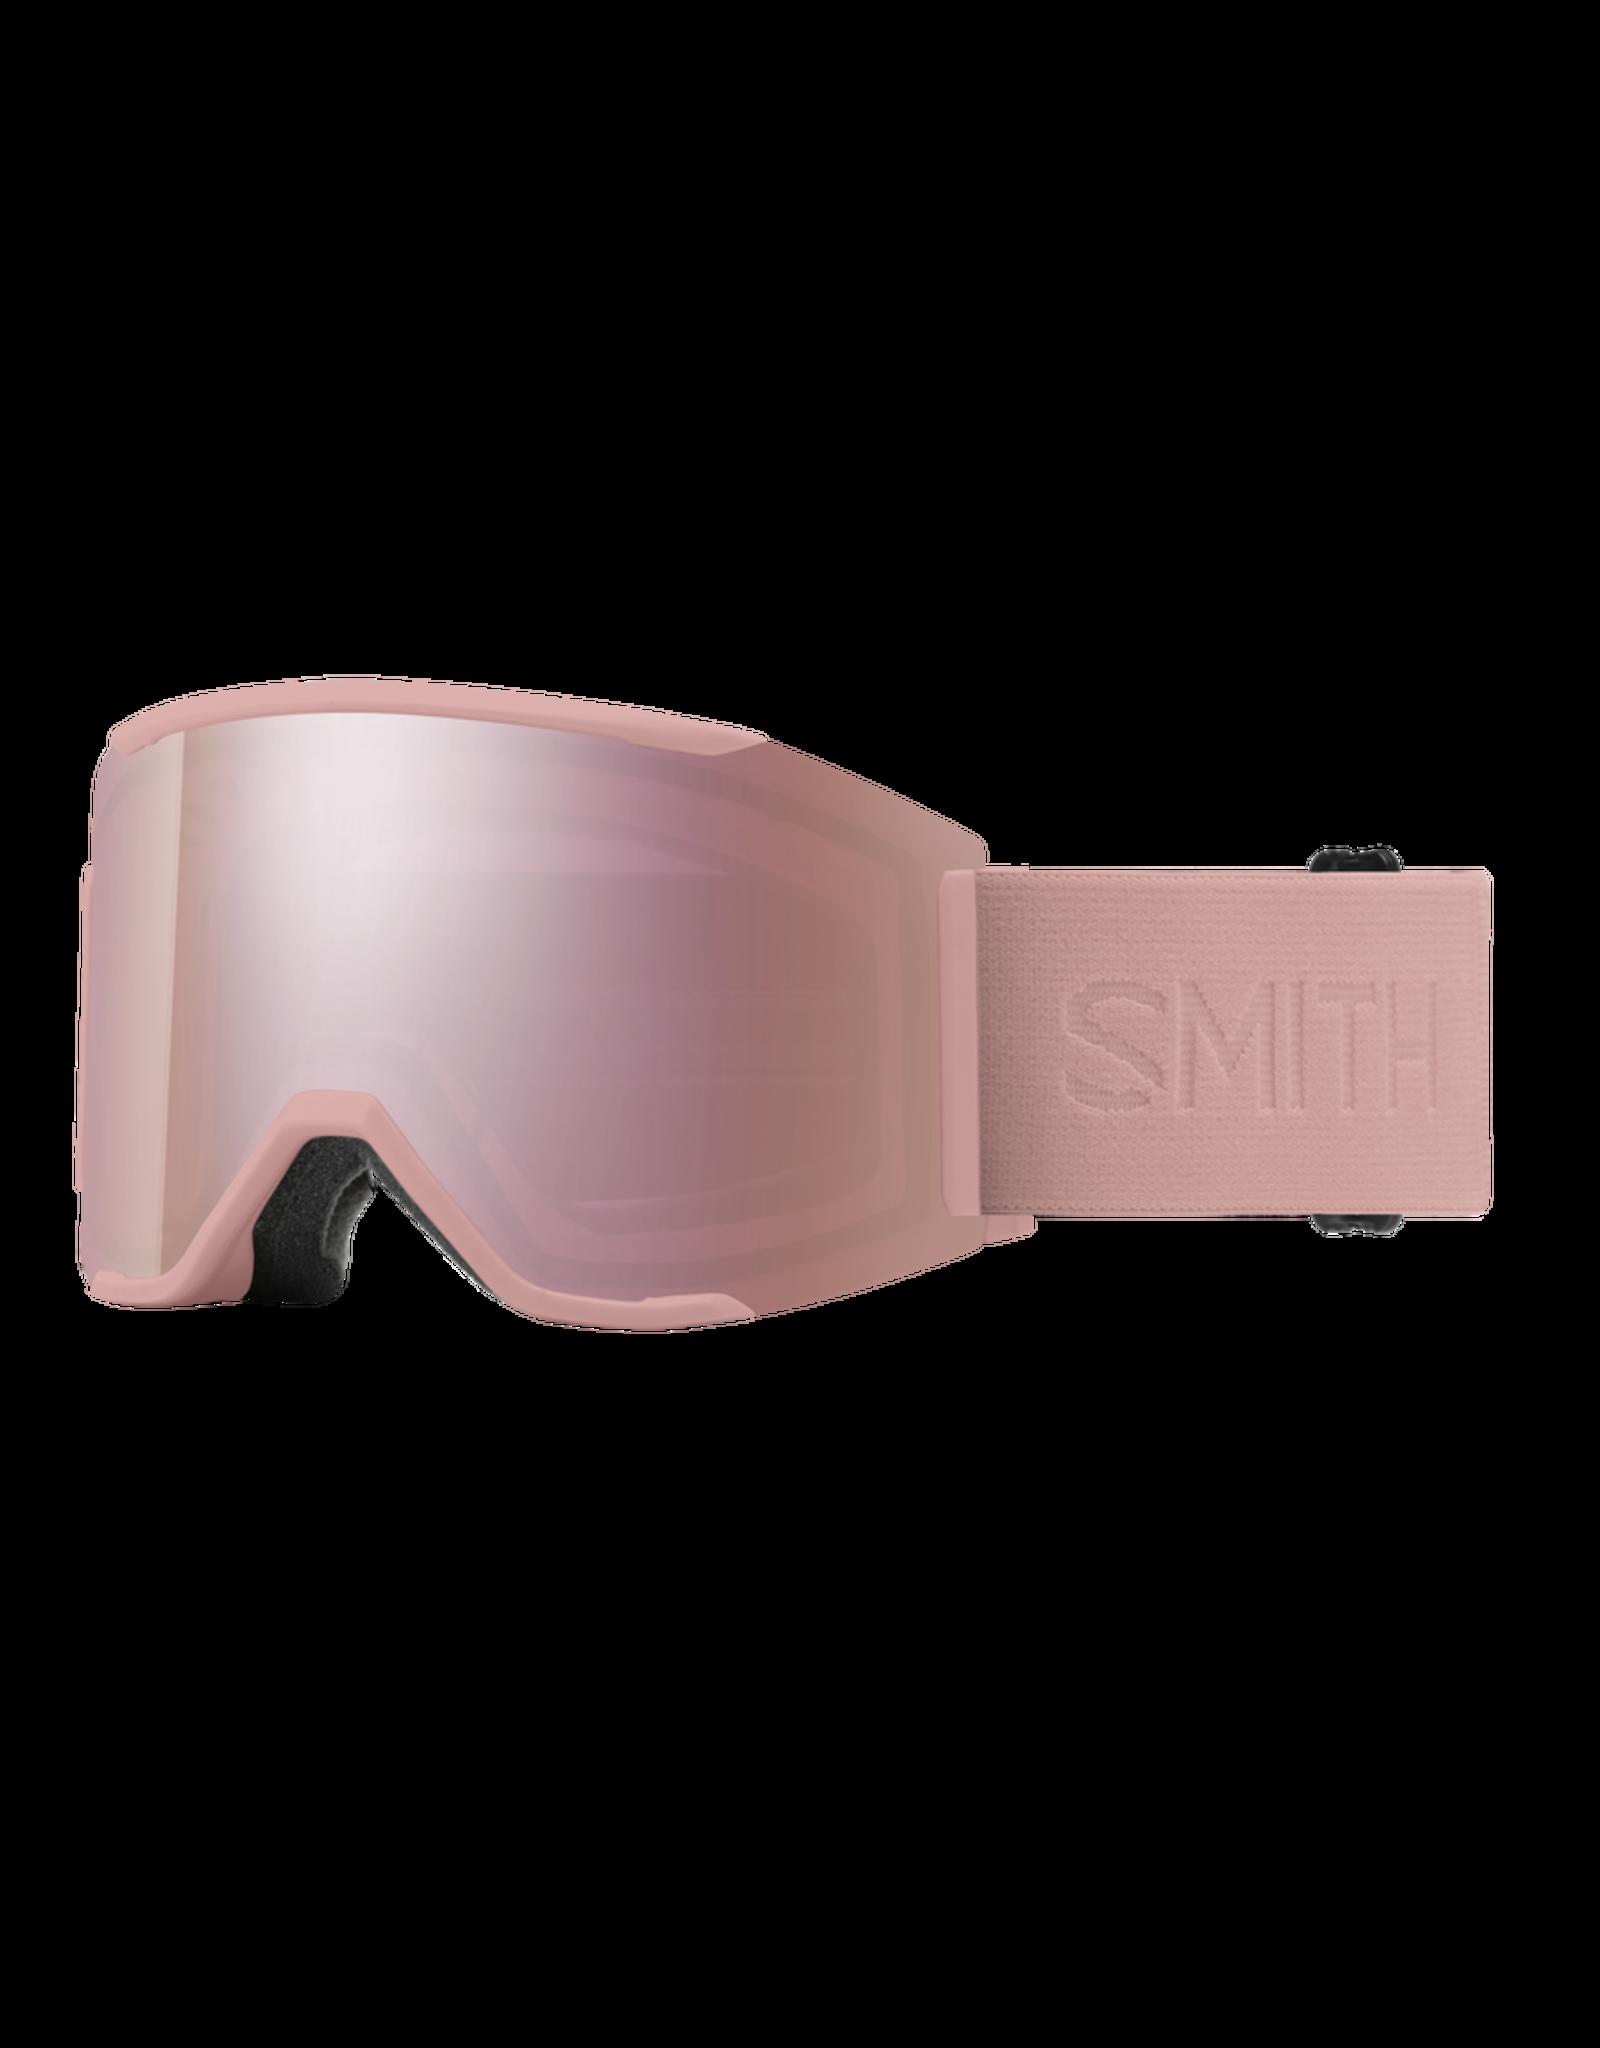 SMITH SQUAD MAG ROCK SALT FLOOD ROSE GOLD MIRROR W21